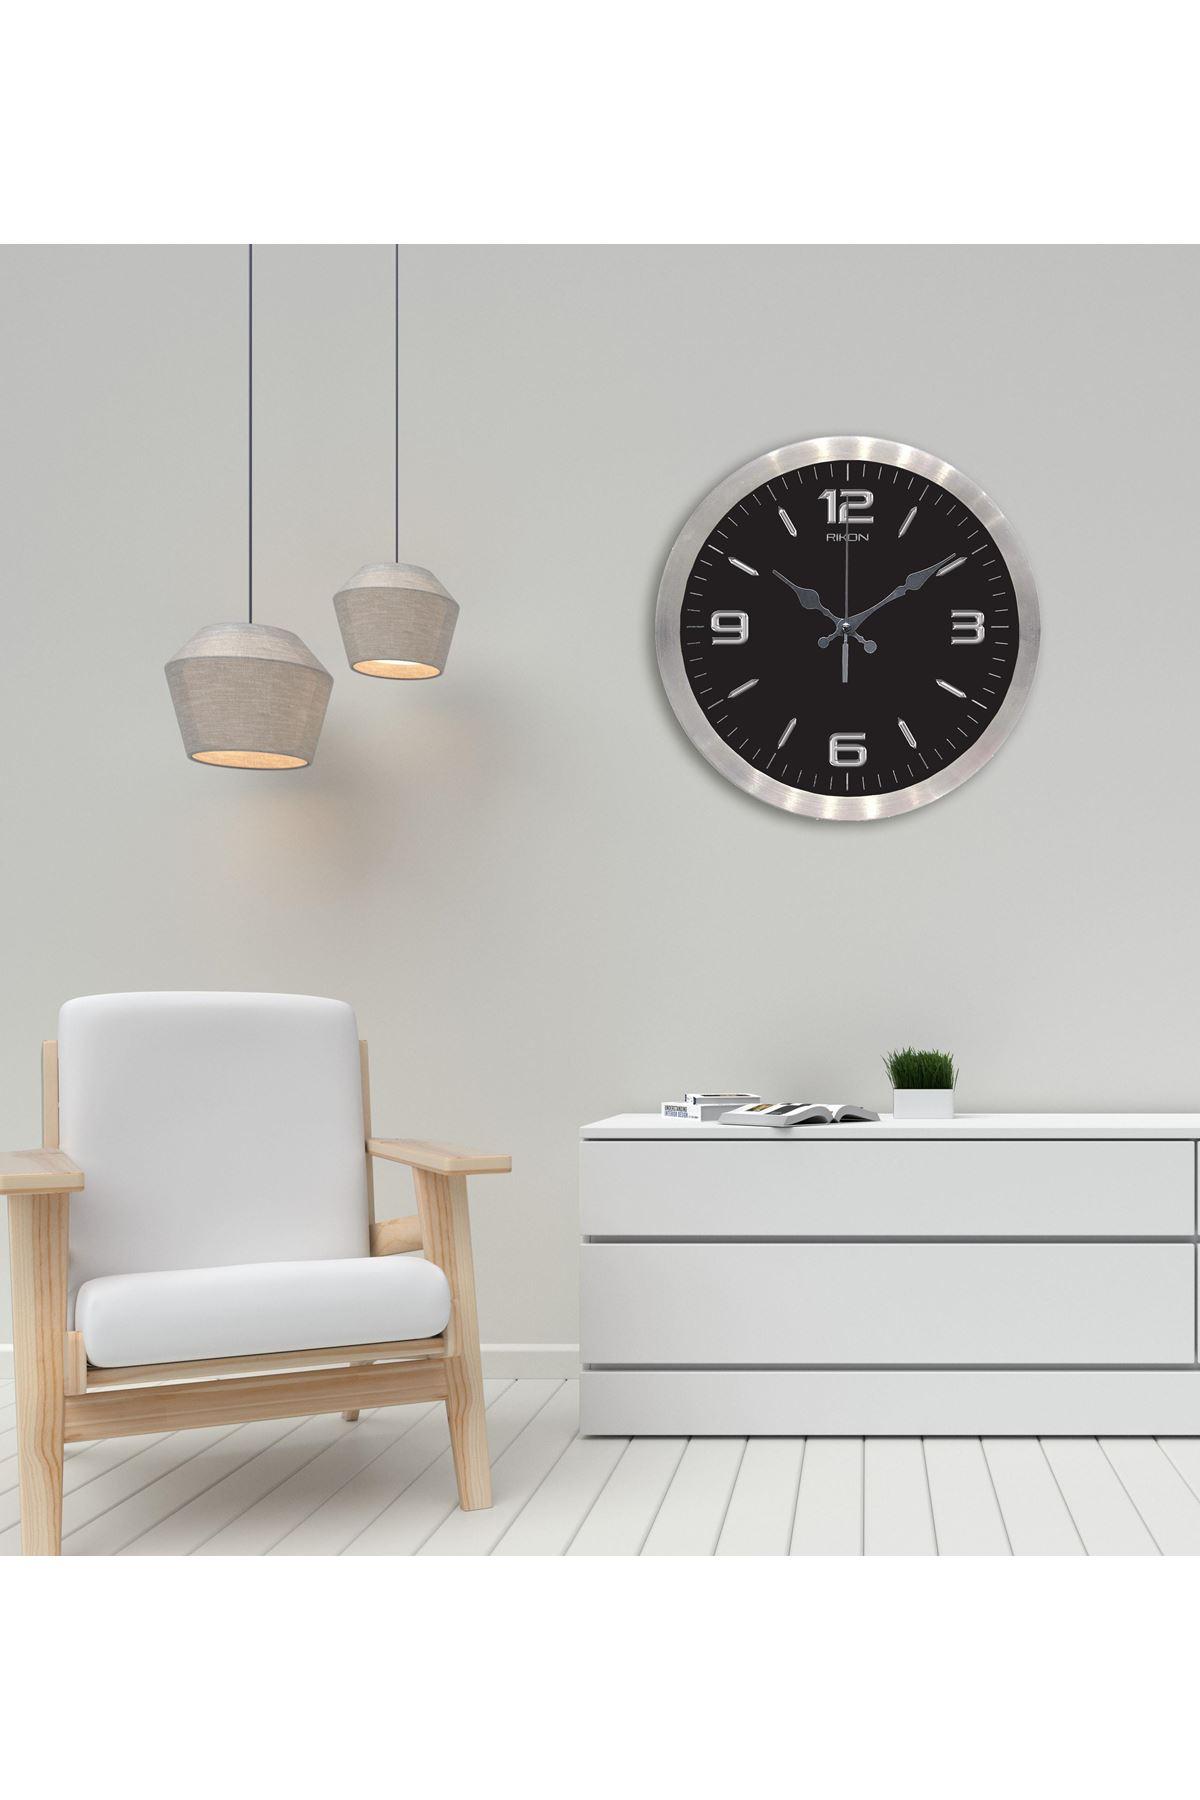 Rikon Metal Dekoratif Ofis Duvar Saati Klasik Silver Black 35X35 Cm